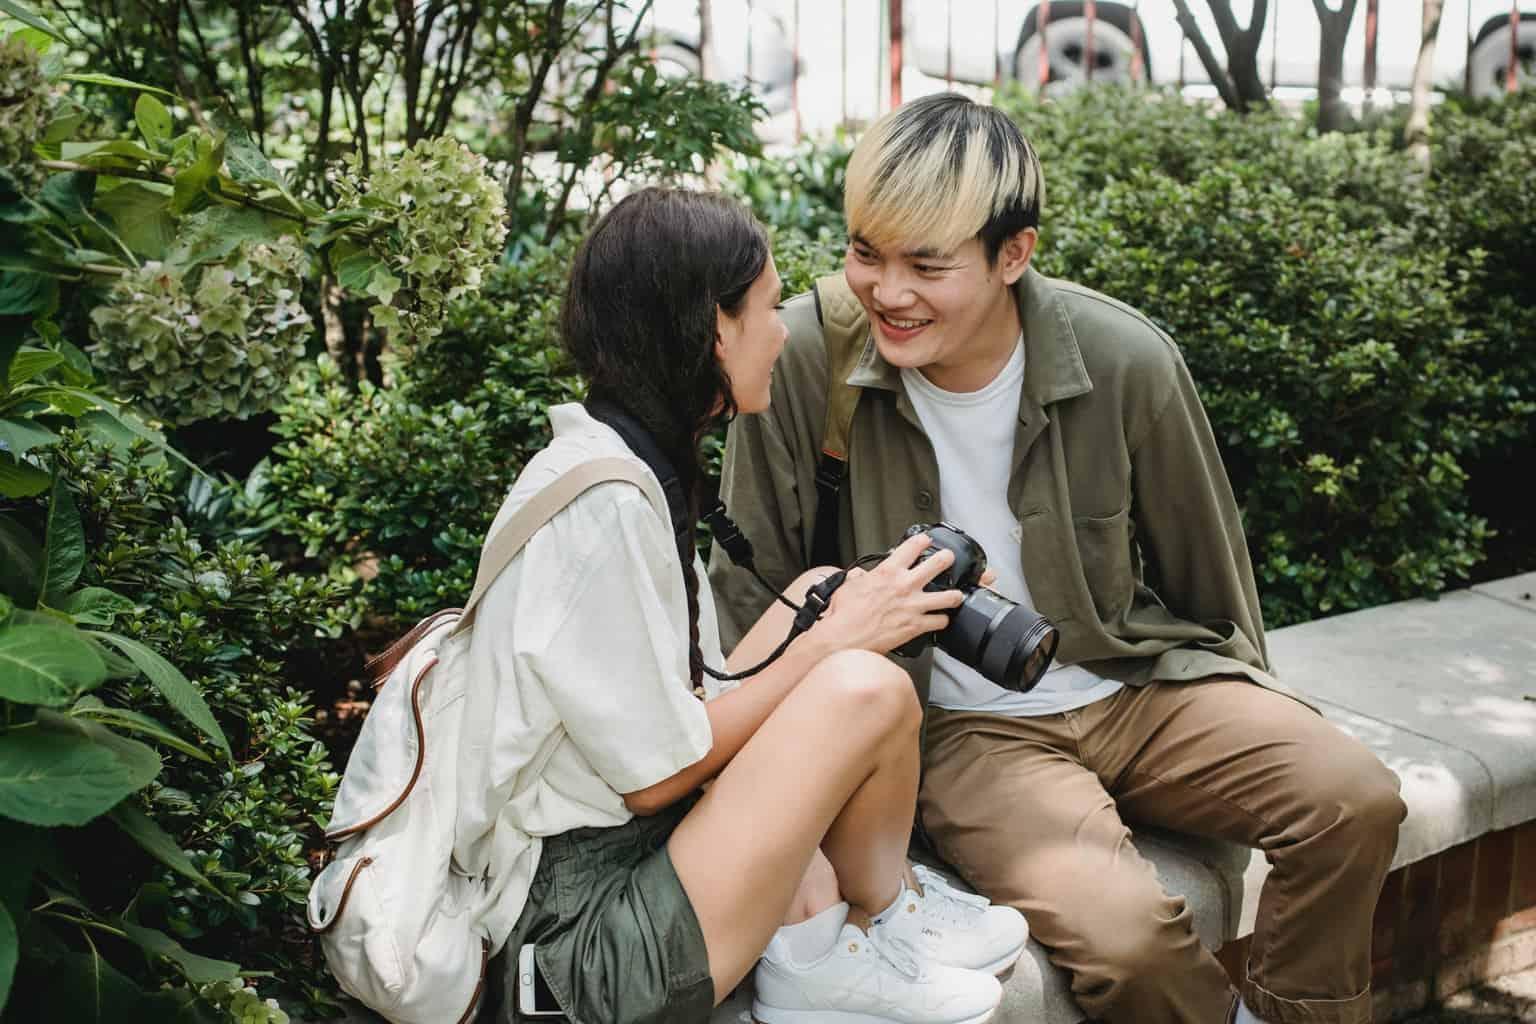 Mensajes de amor para mi novia - Featured